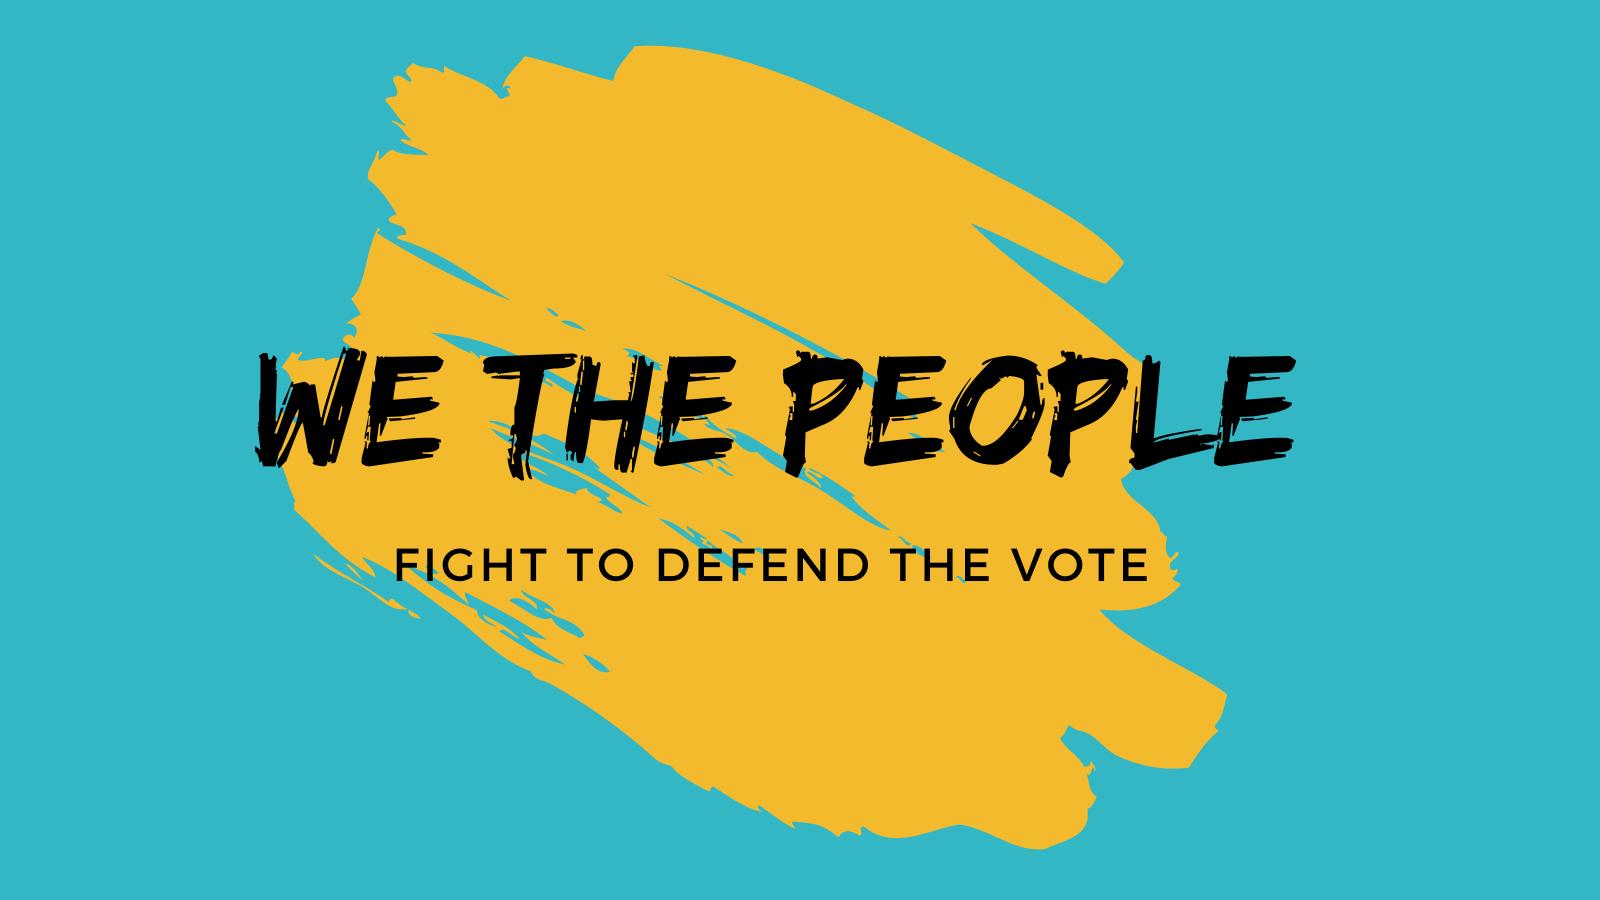 Defend_the_vote_banner_-_black_